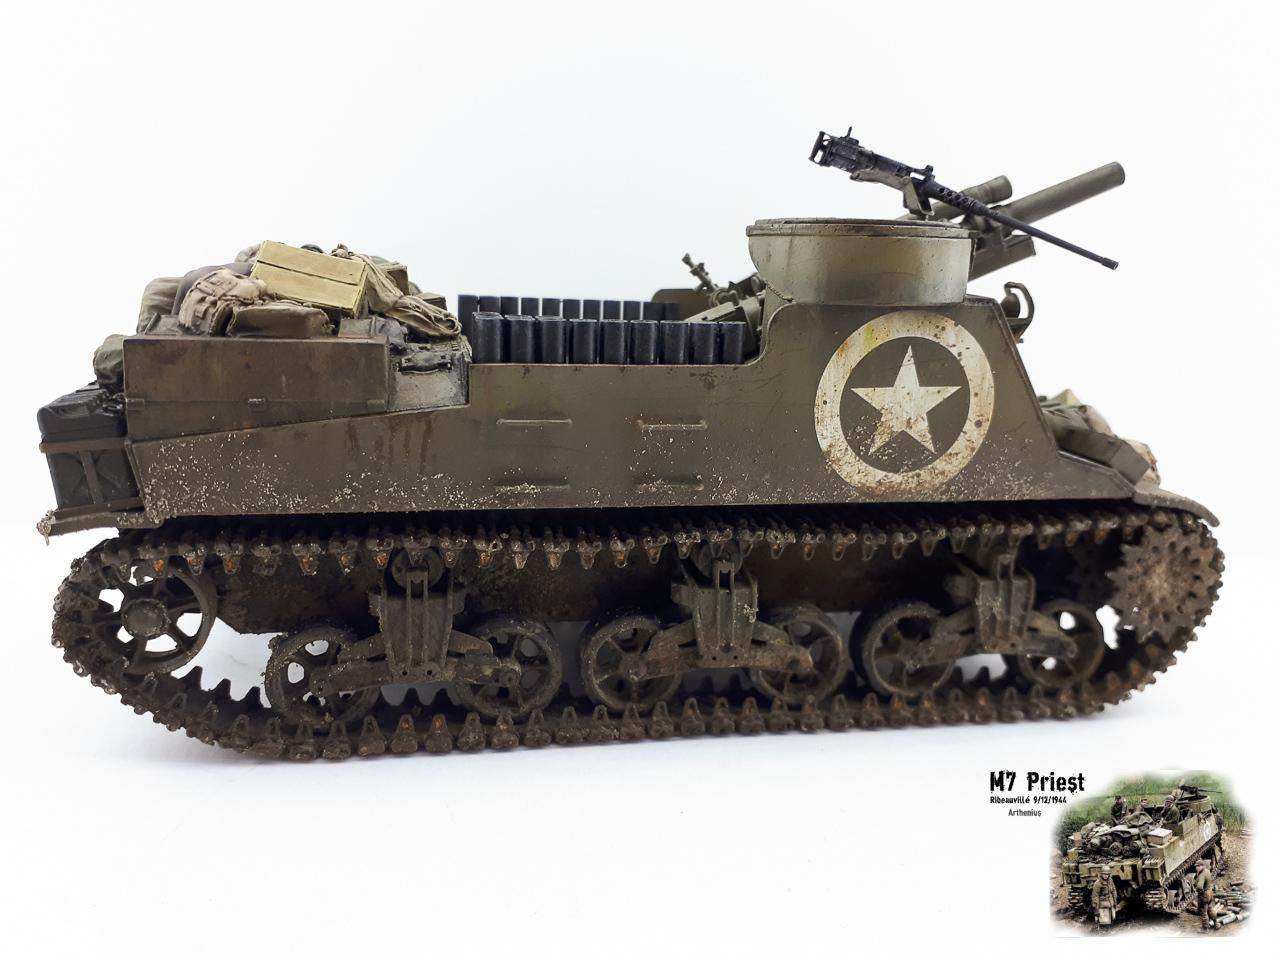 M7 Priest Ribeauvillé 9/12/1944 - Page 3 2018-114